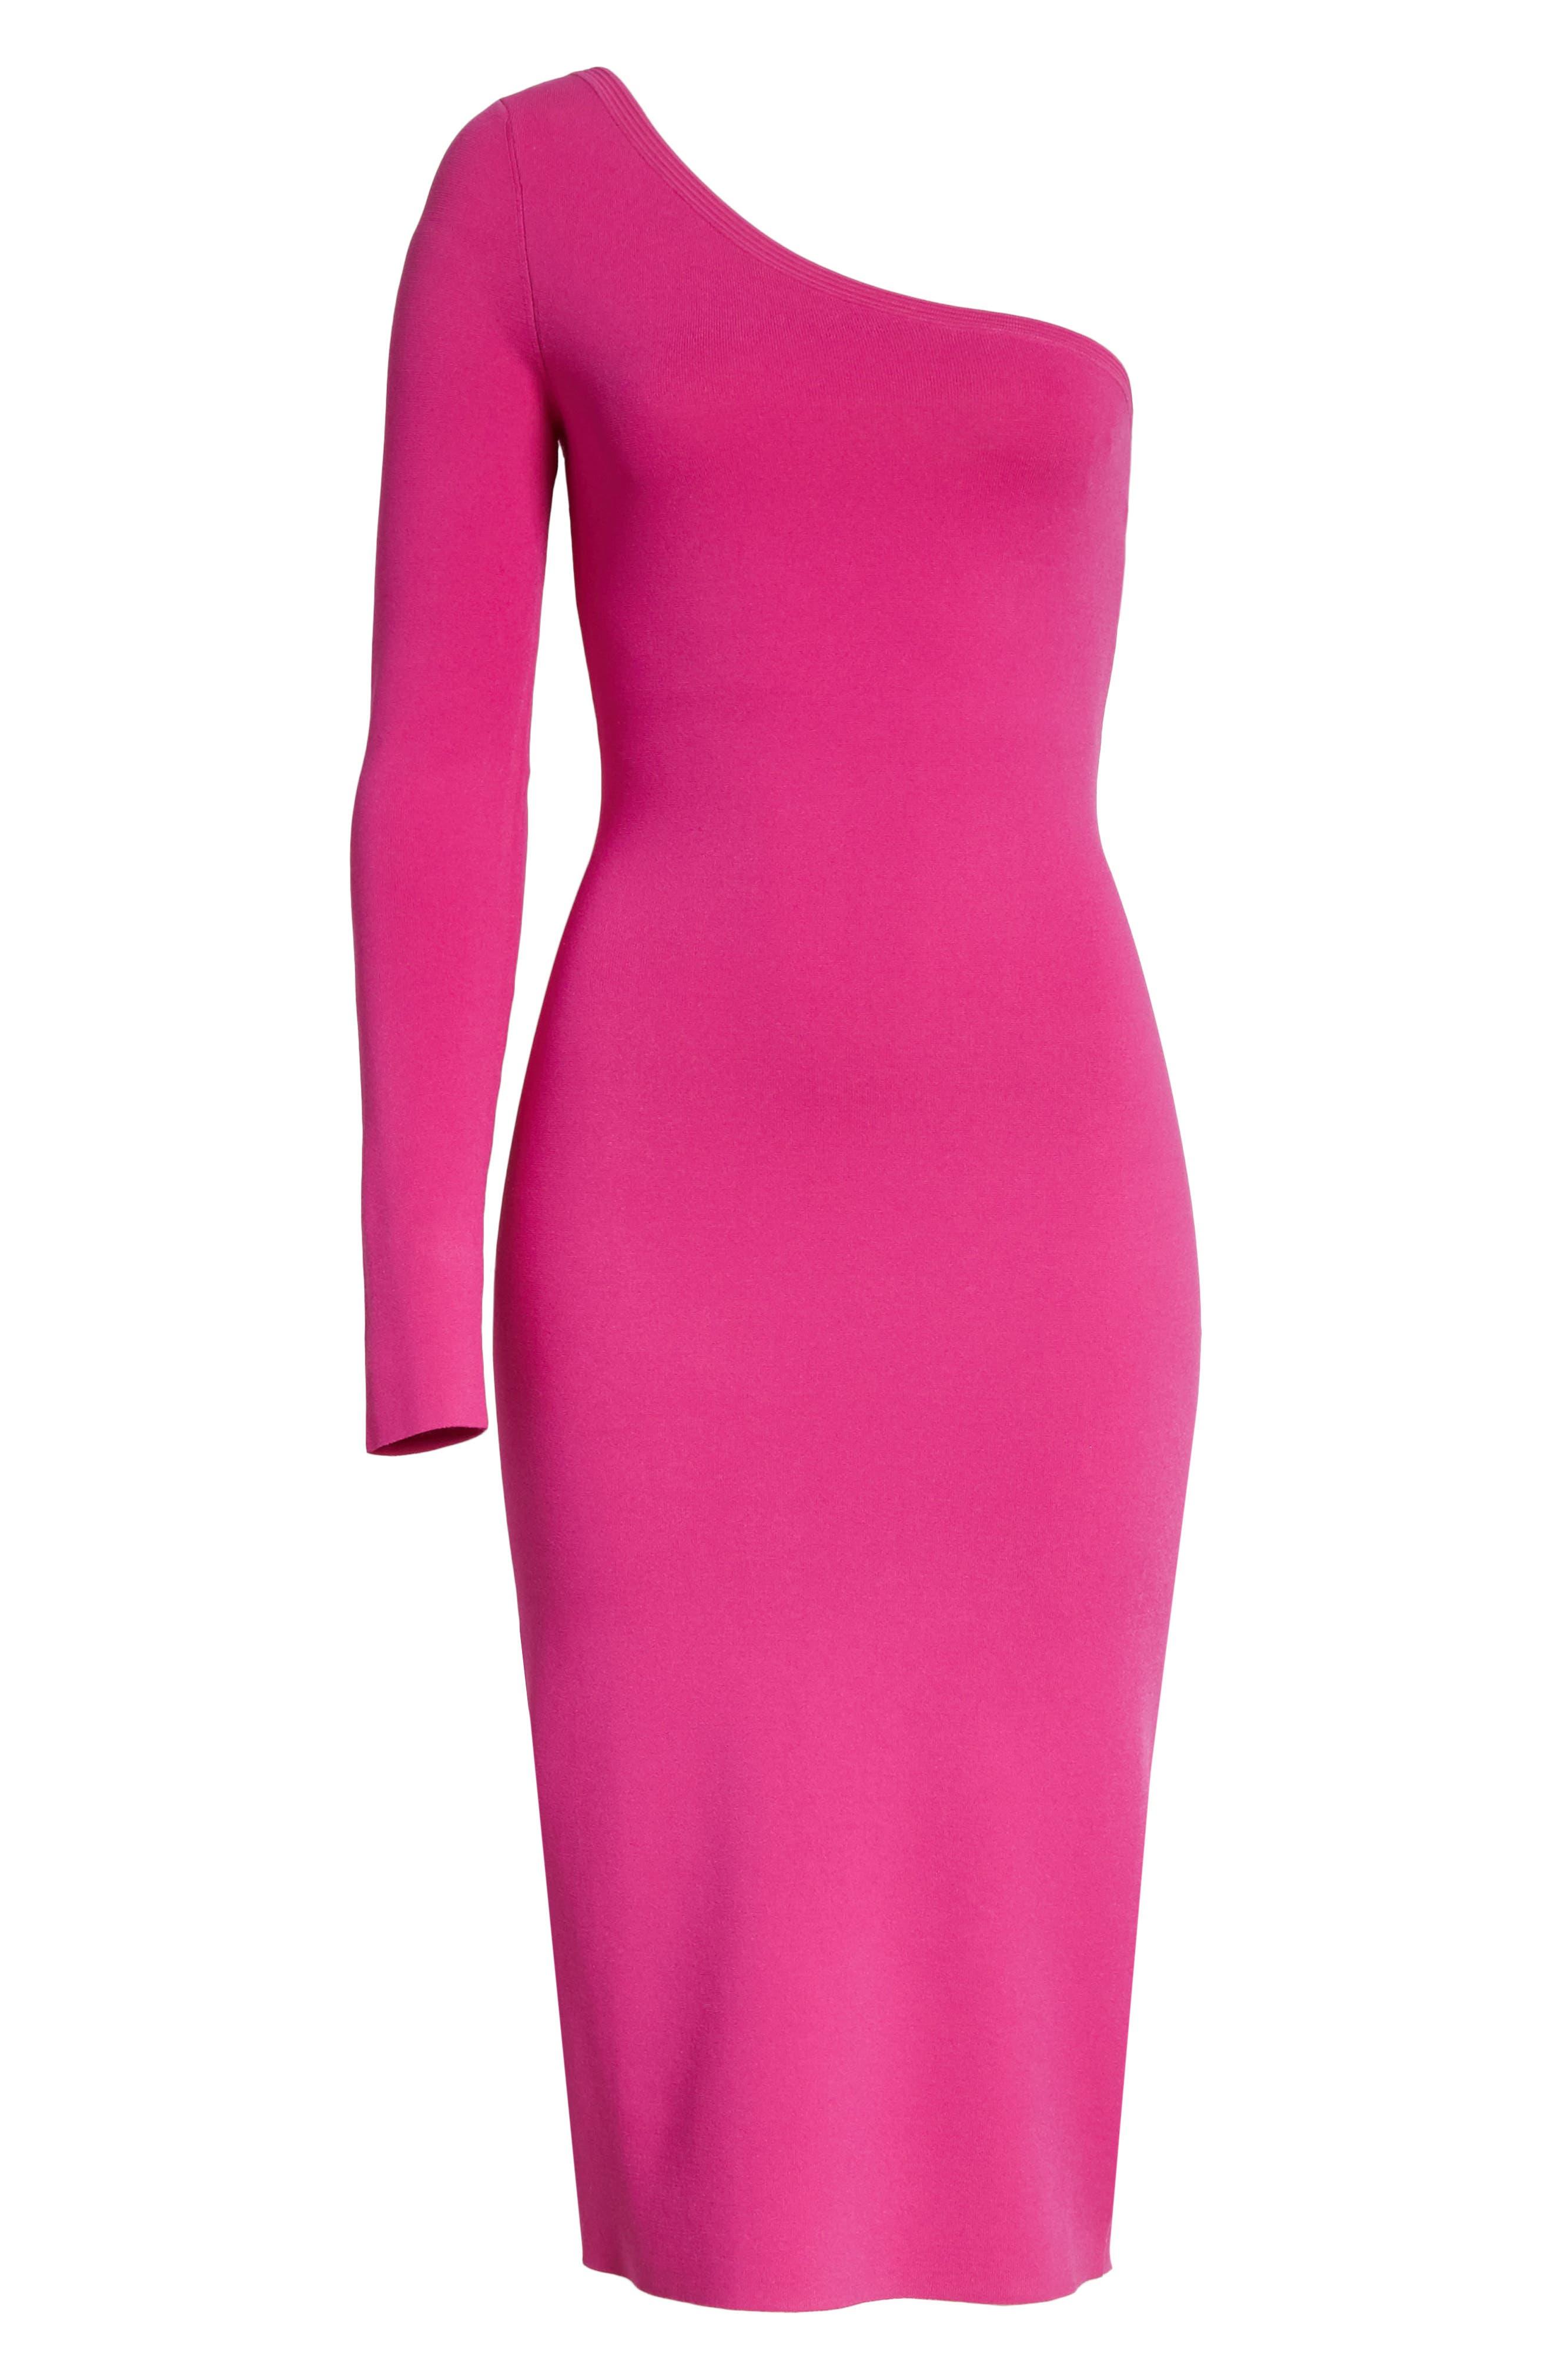 Diane von Furstenberg Knit One-Shoulder Midi Dress,                             Alternate thumbnail 6, color,                             Ribbon Pink